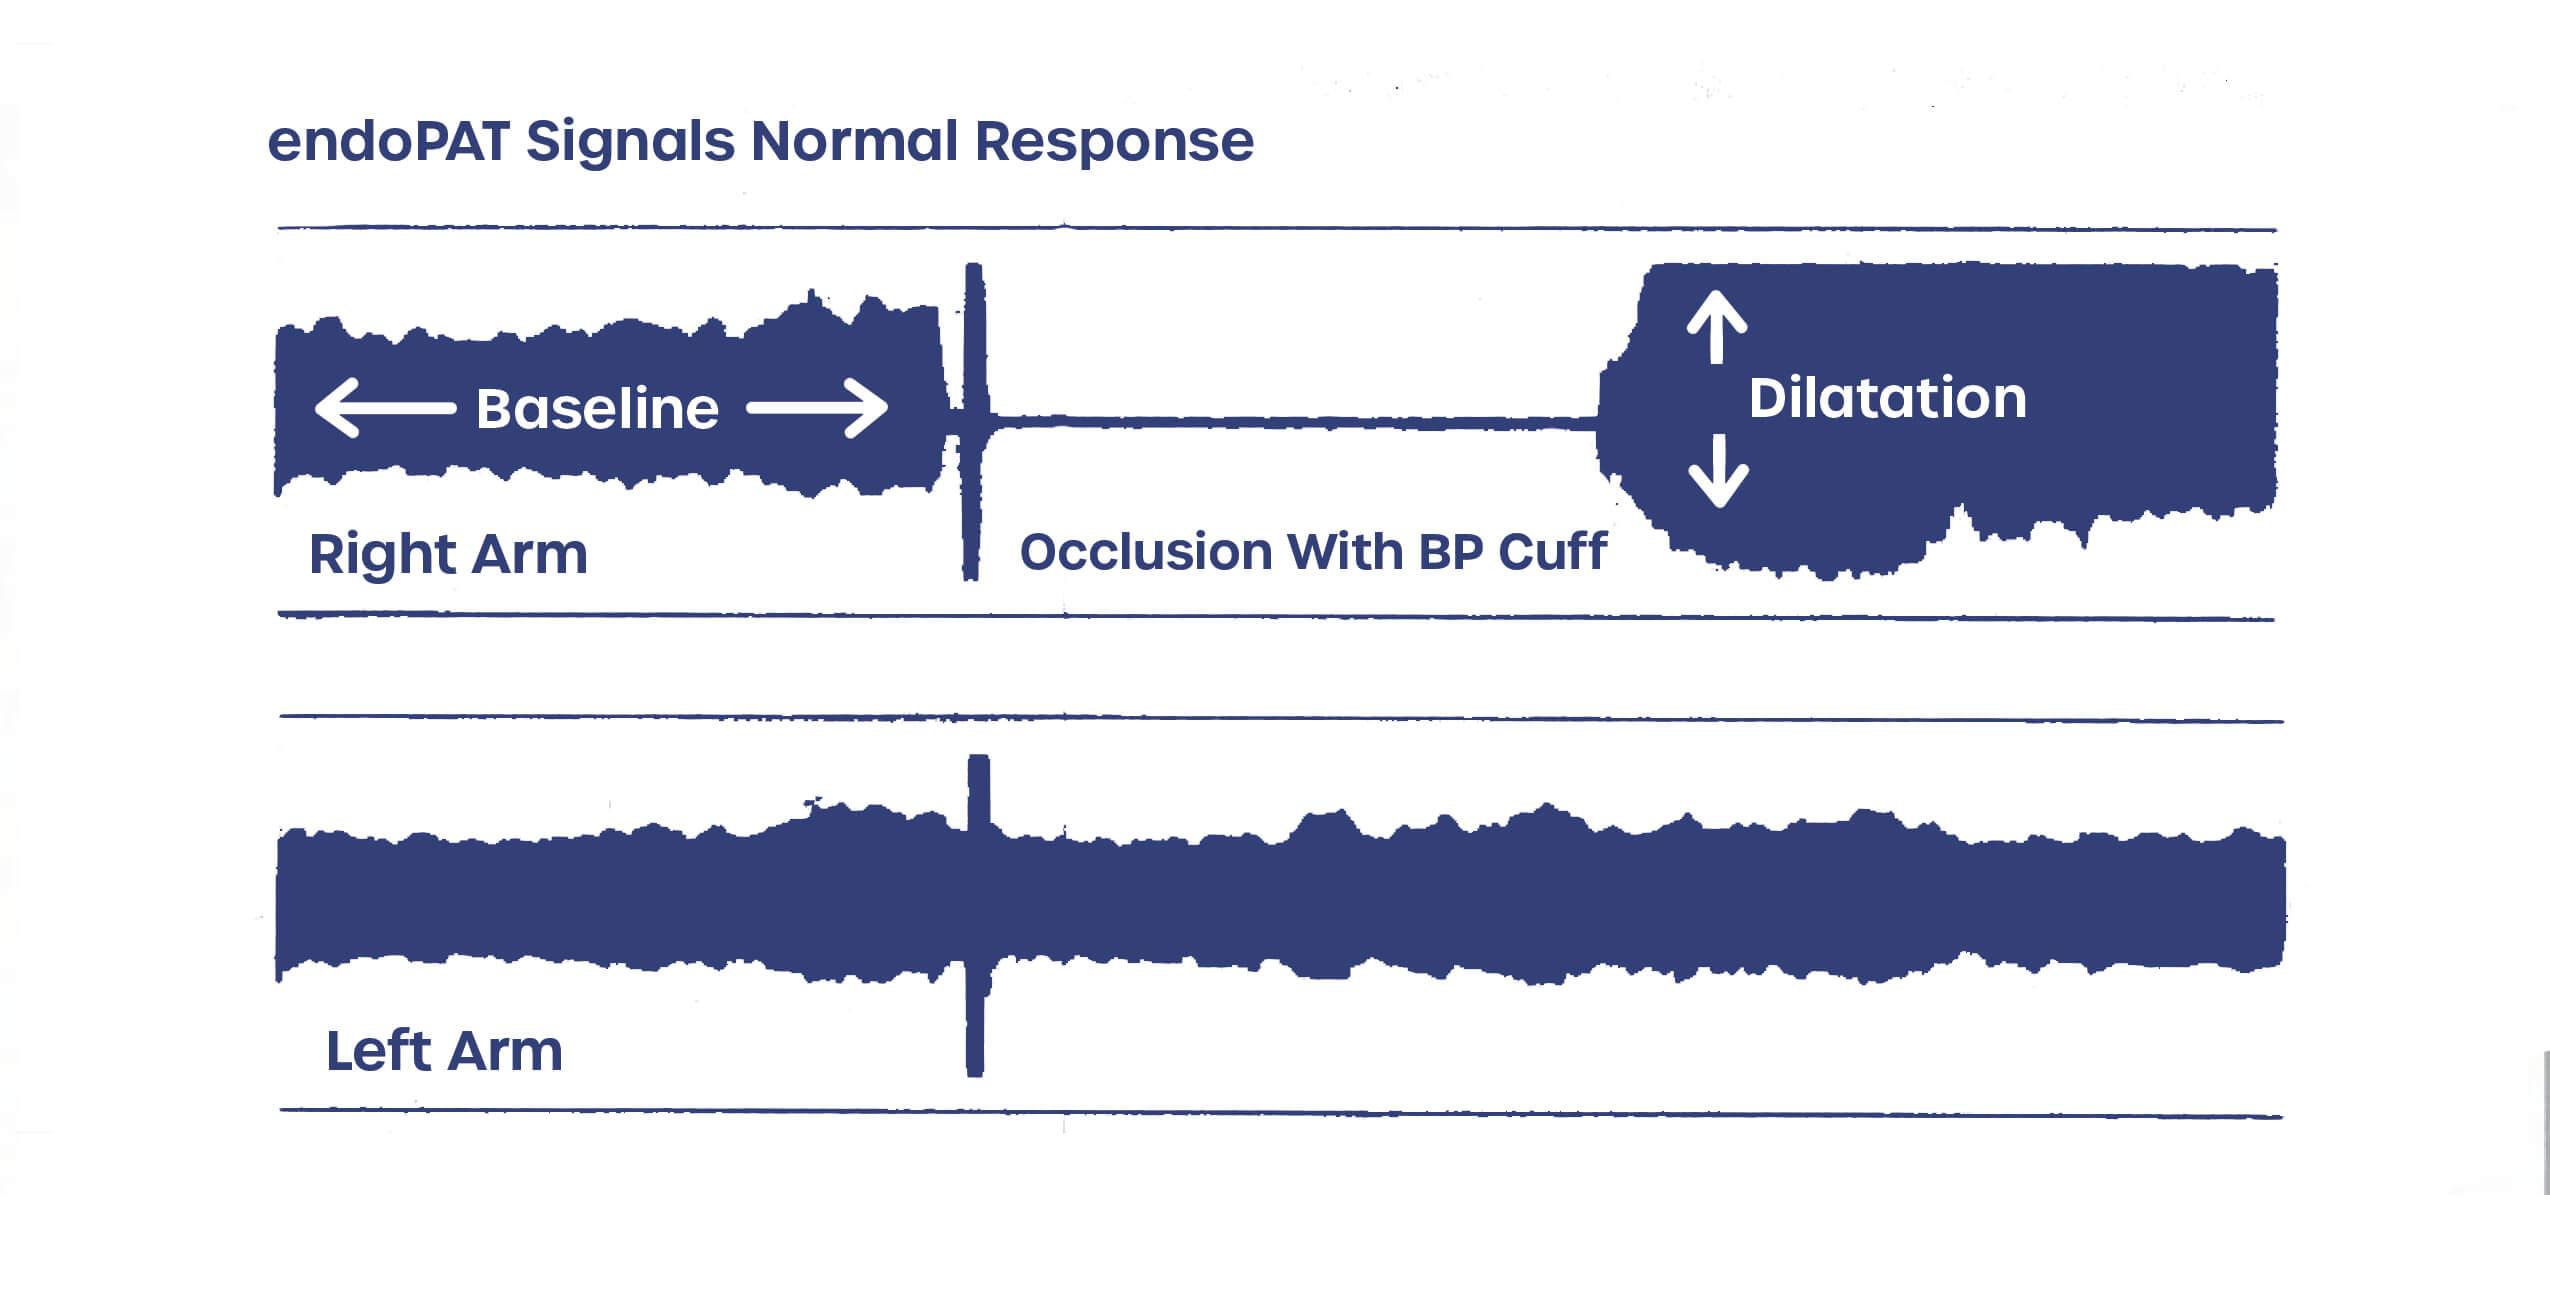 EndoPAT signals normal response